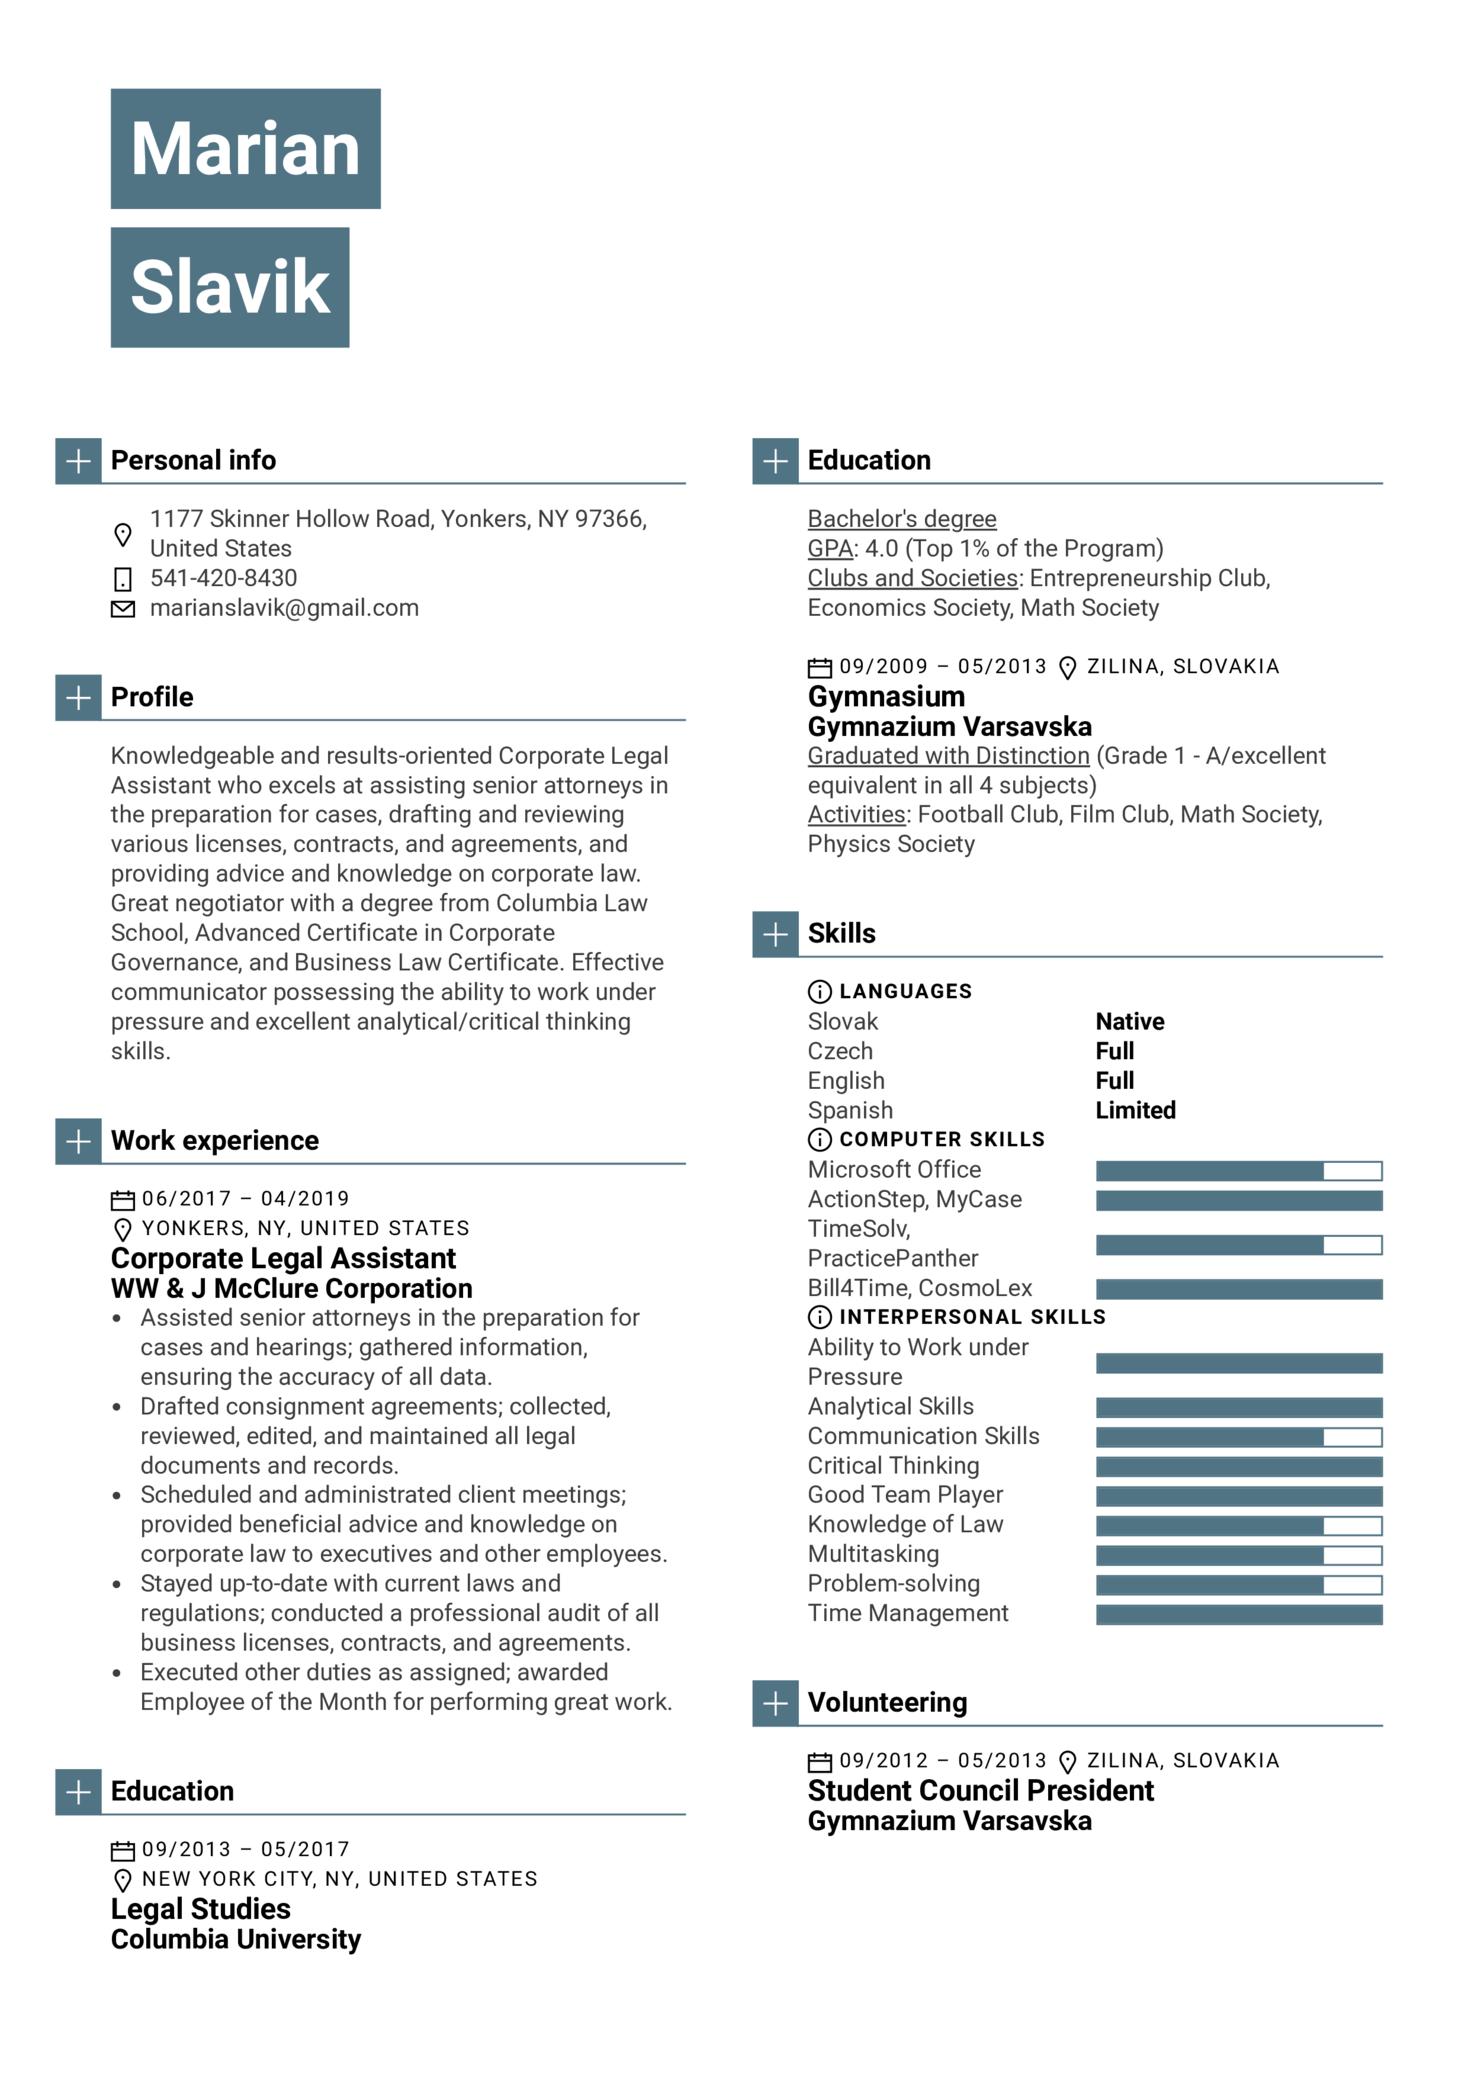 Corporate Legal Assistant Resume Sample (Part 1)